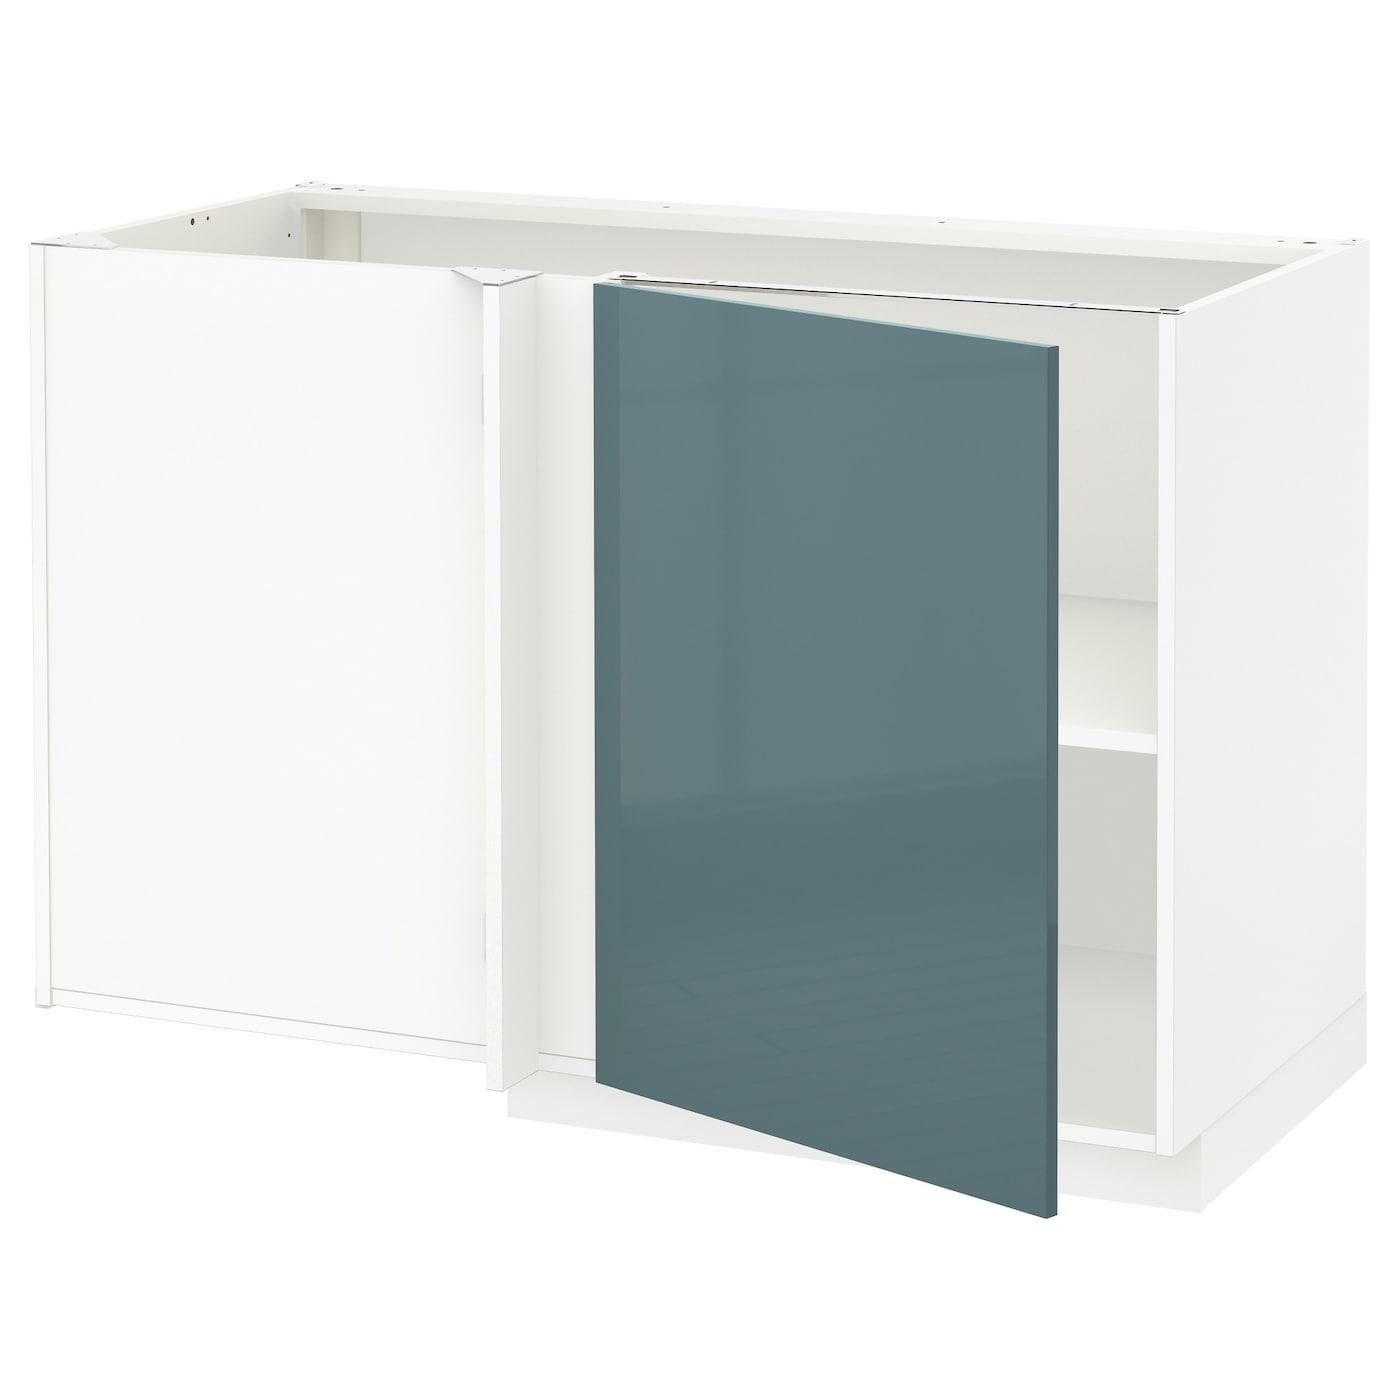 Ikea Kitchen Shelf Grey